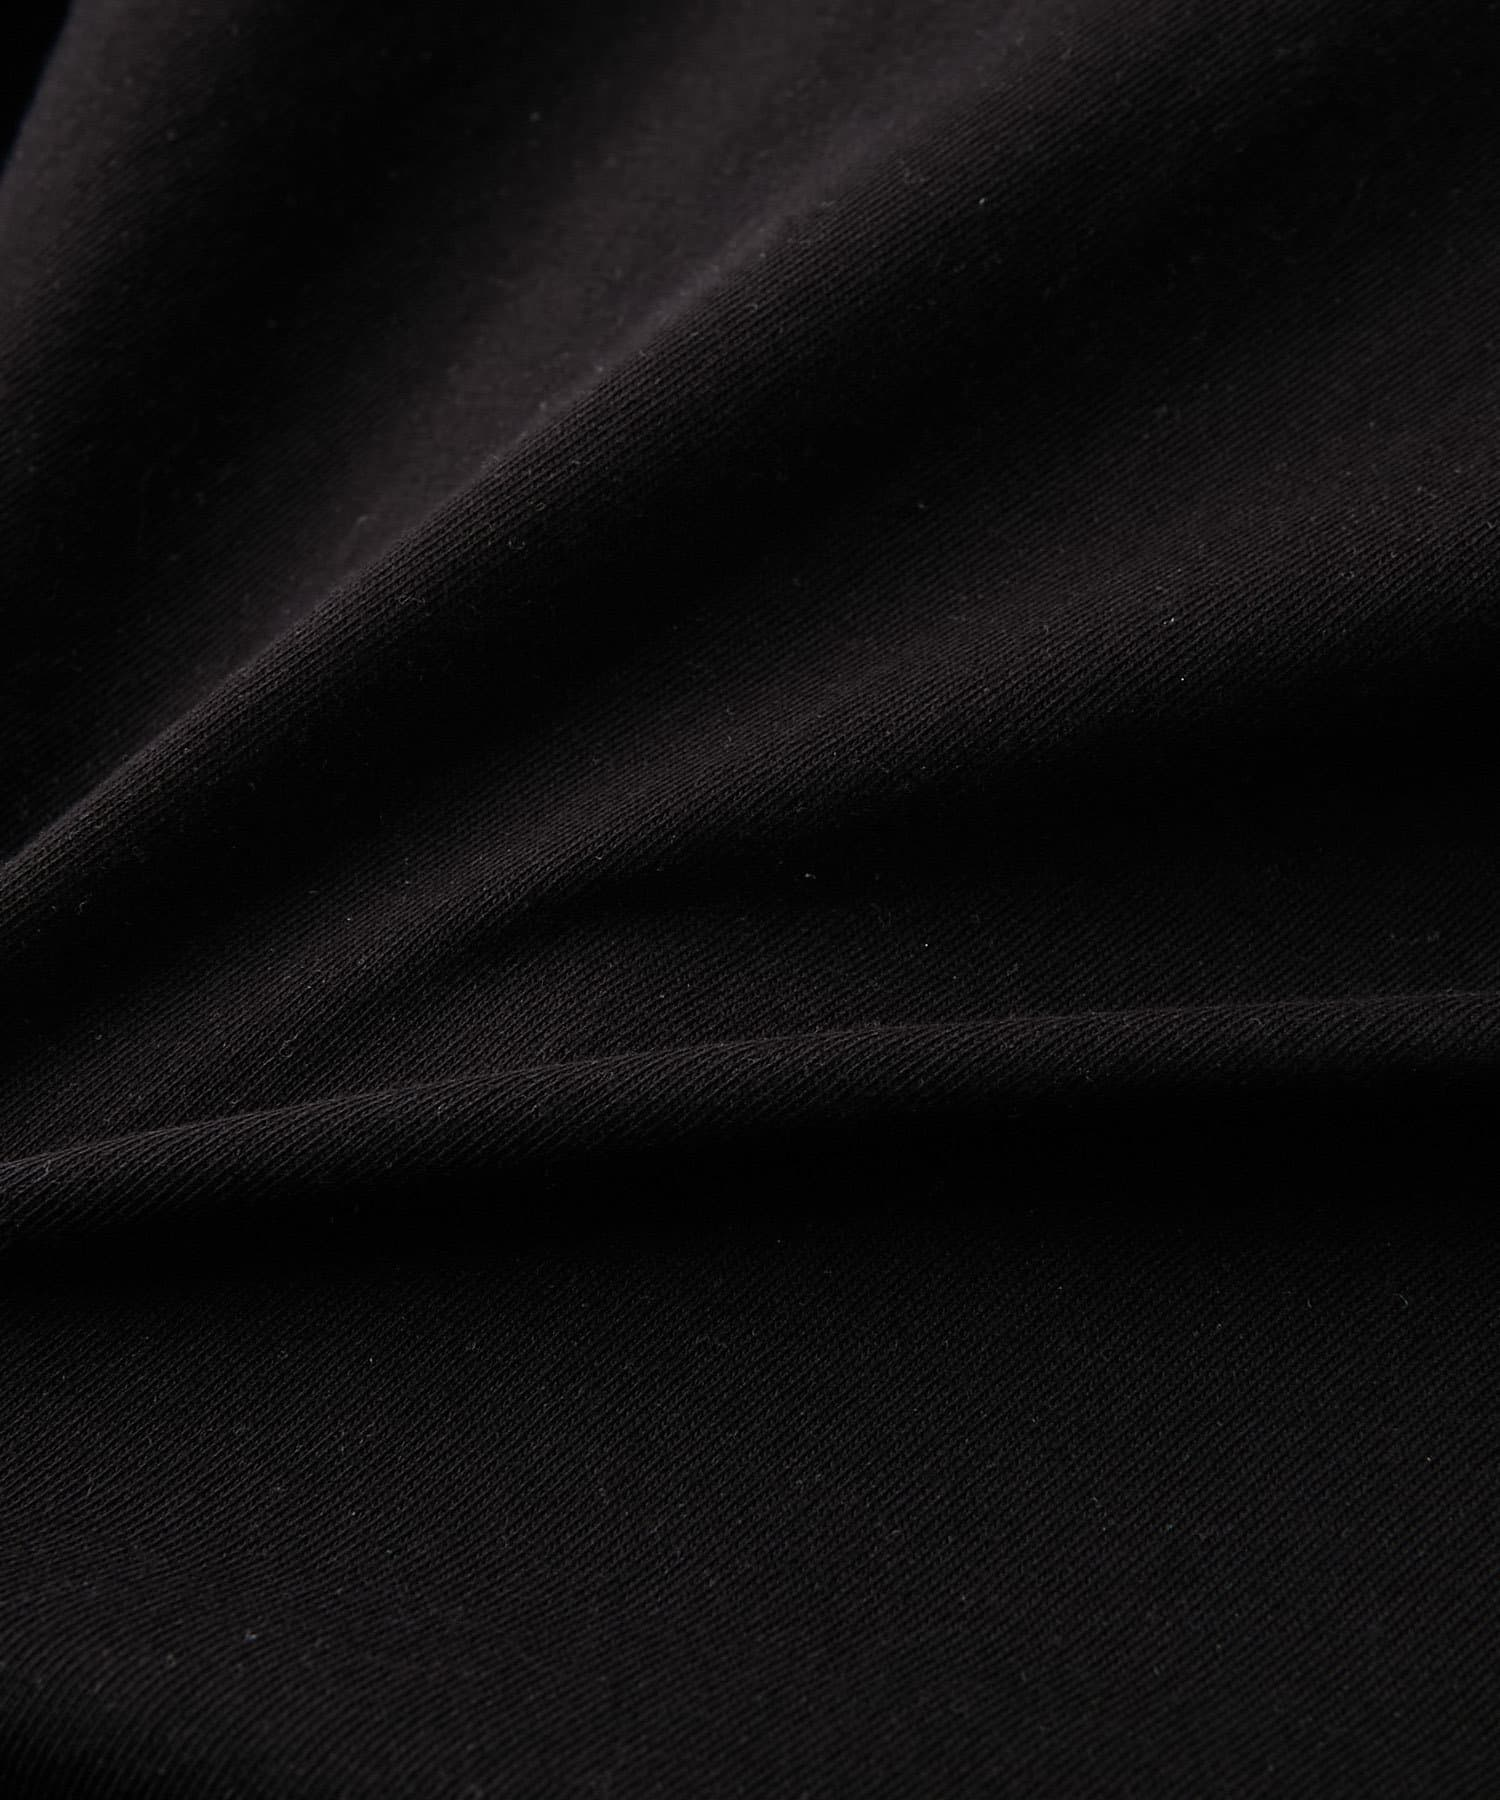 RIVE DROITE(リヴドロワ) 【動画付き《幅広いスタイルに活躍》洗える】コットンラウンドTシャツ